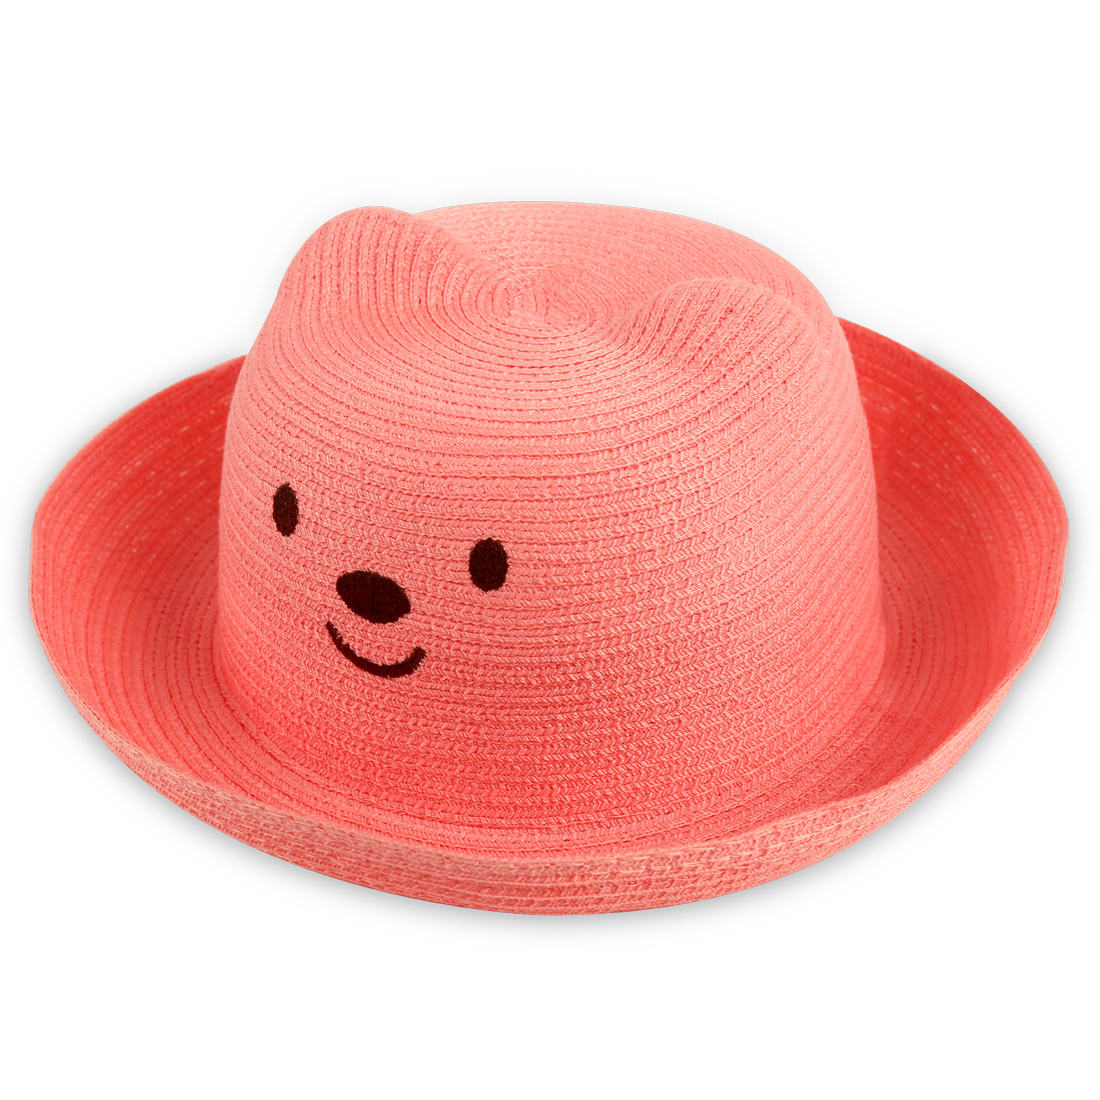 Kids Lovely 3D Bear Head Design Elastic Neck Strap Design Watermelon Red Hat